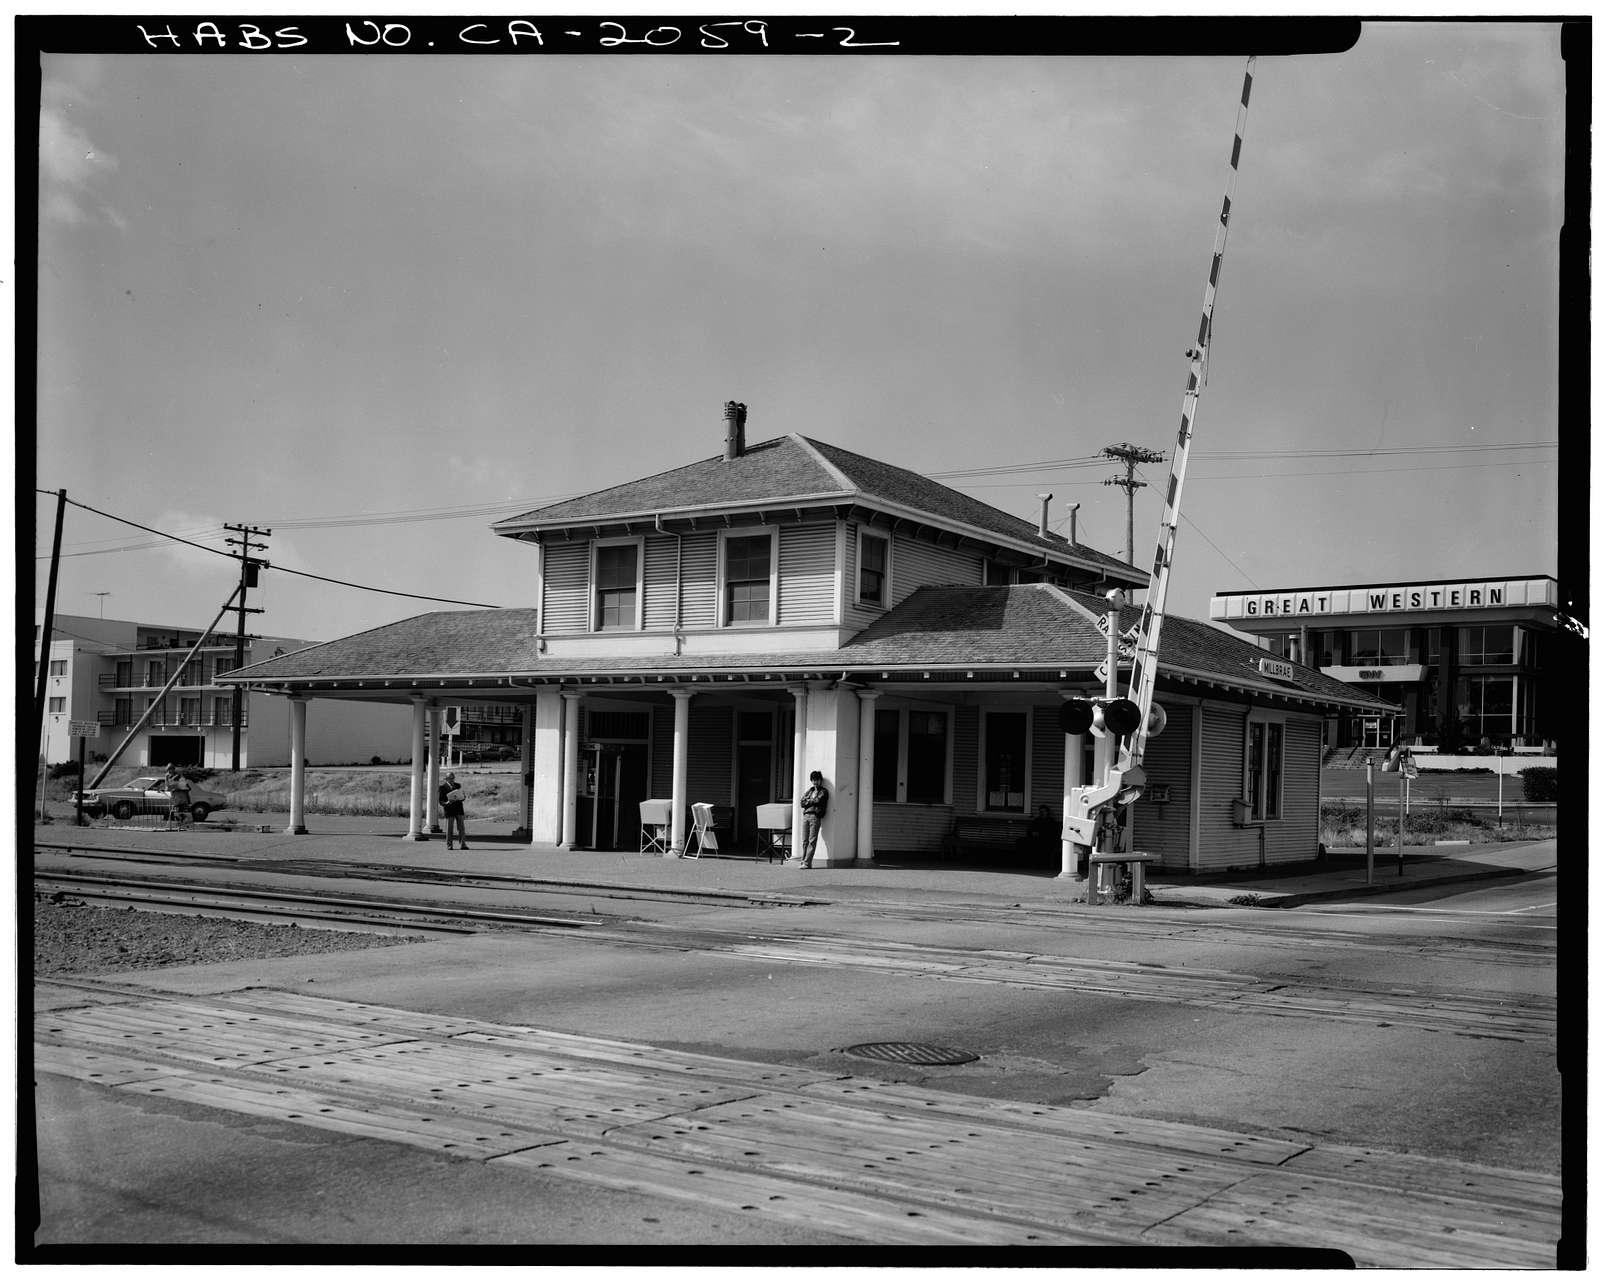 Southern Pacific Depot, 21 East Millbrae Avenue, Millbrae, San Mateo County, CA